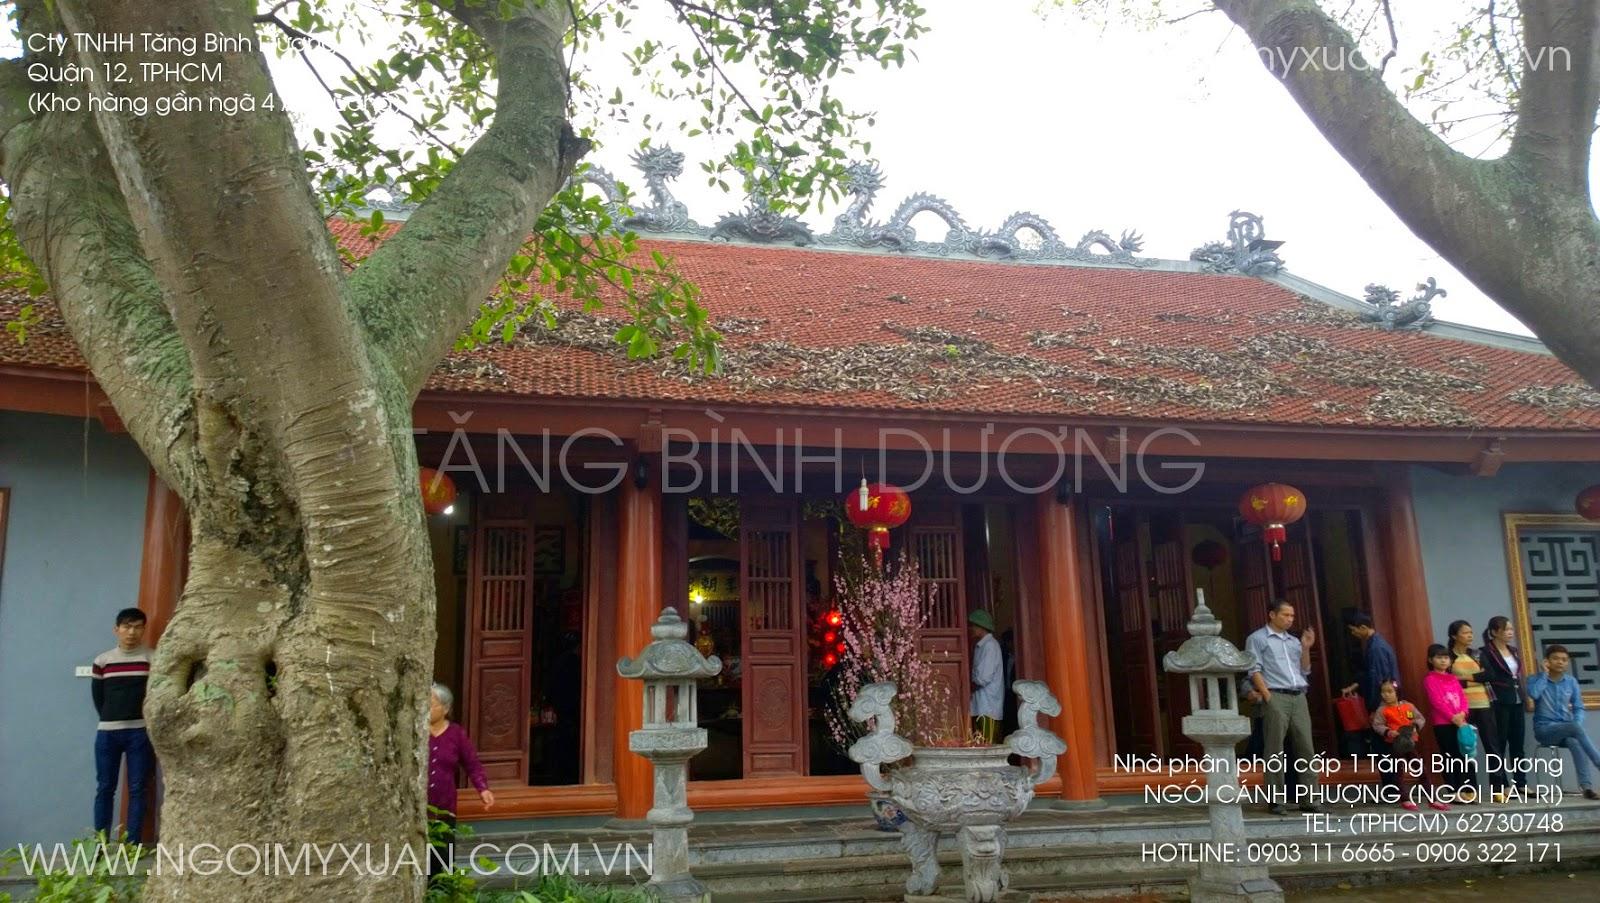 ngoi canh phuong (ngoi hai ri)